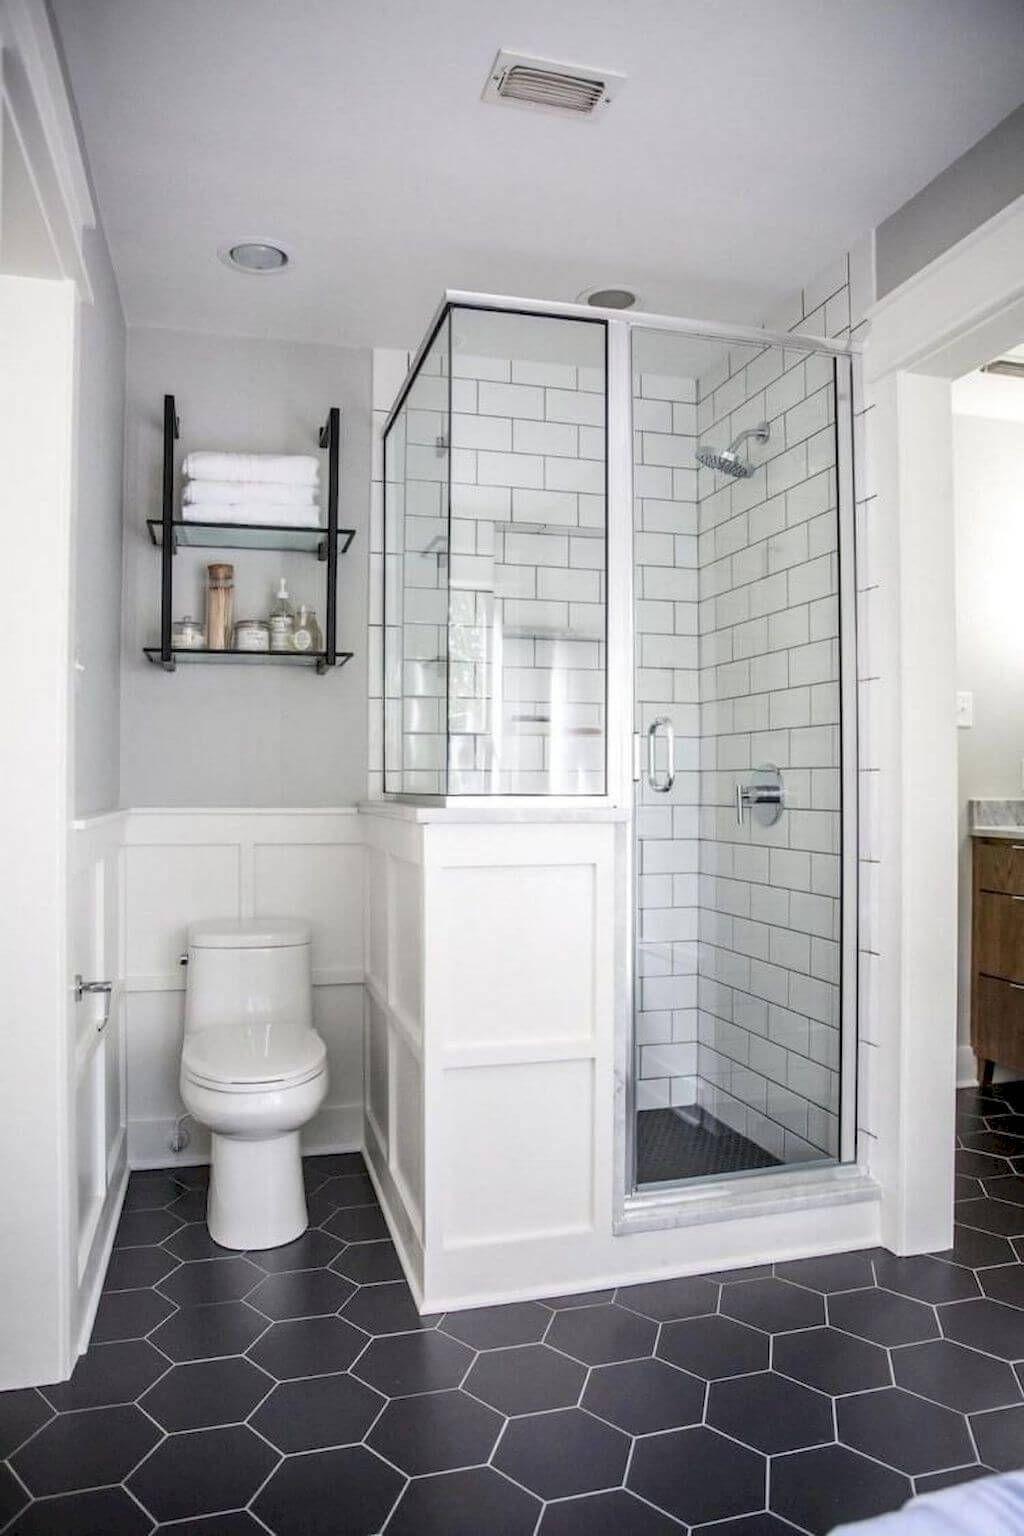 55 Unique Master Bathroom Ideas 2020 You Can Try Today Dovenda In 2020 Small Bathroom Remodel Designs Bathroom Design Small Small Master Bathroom